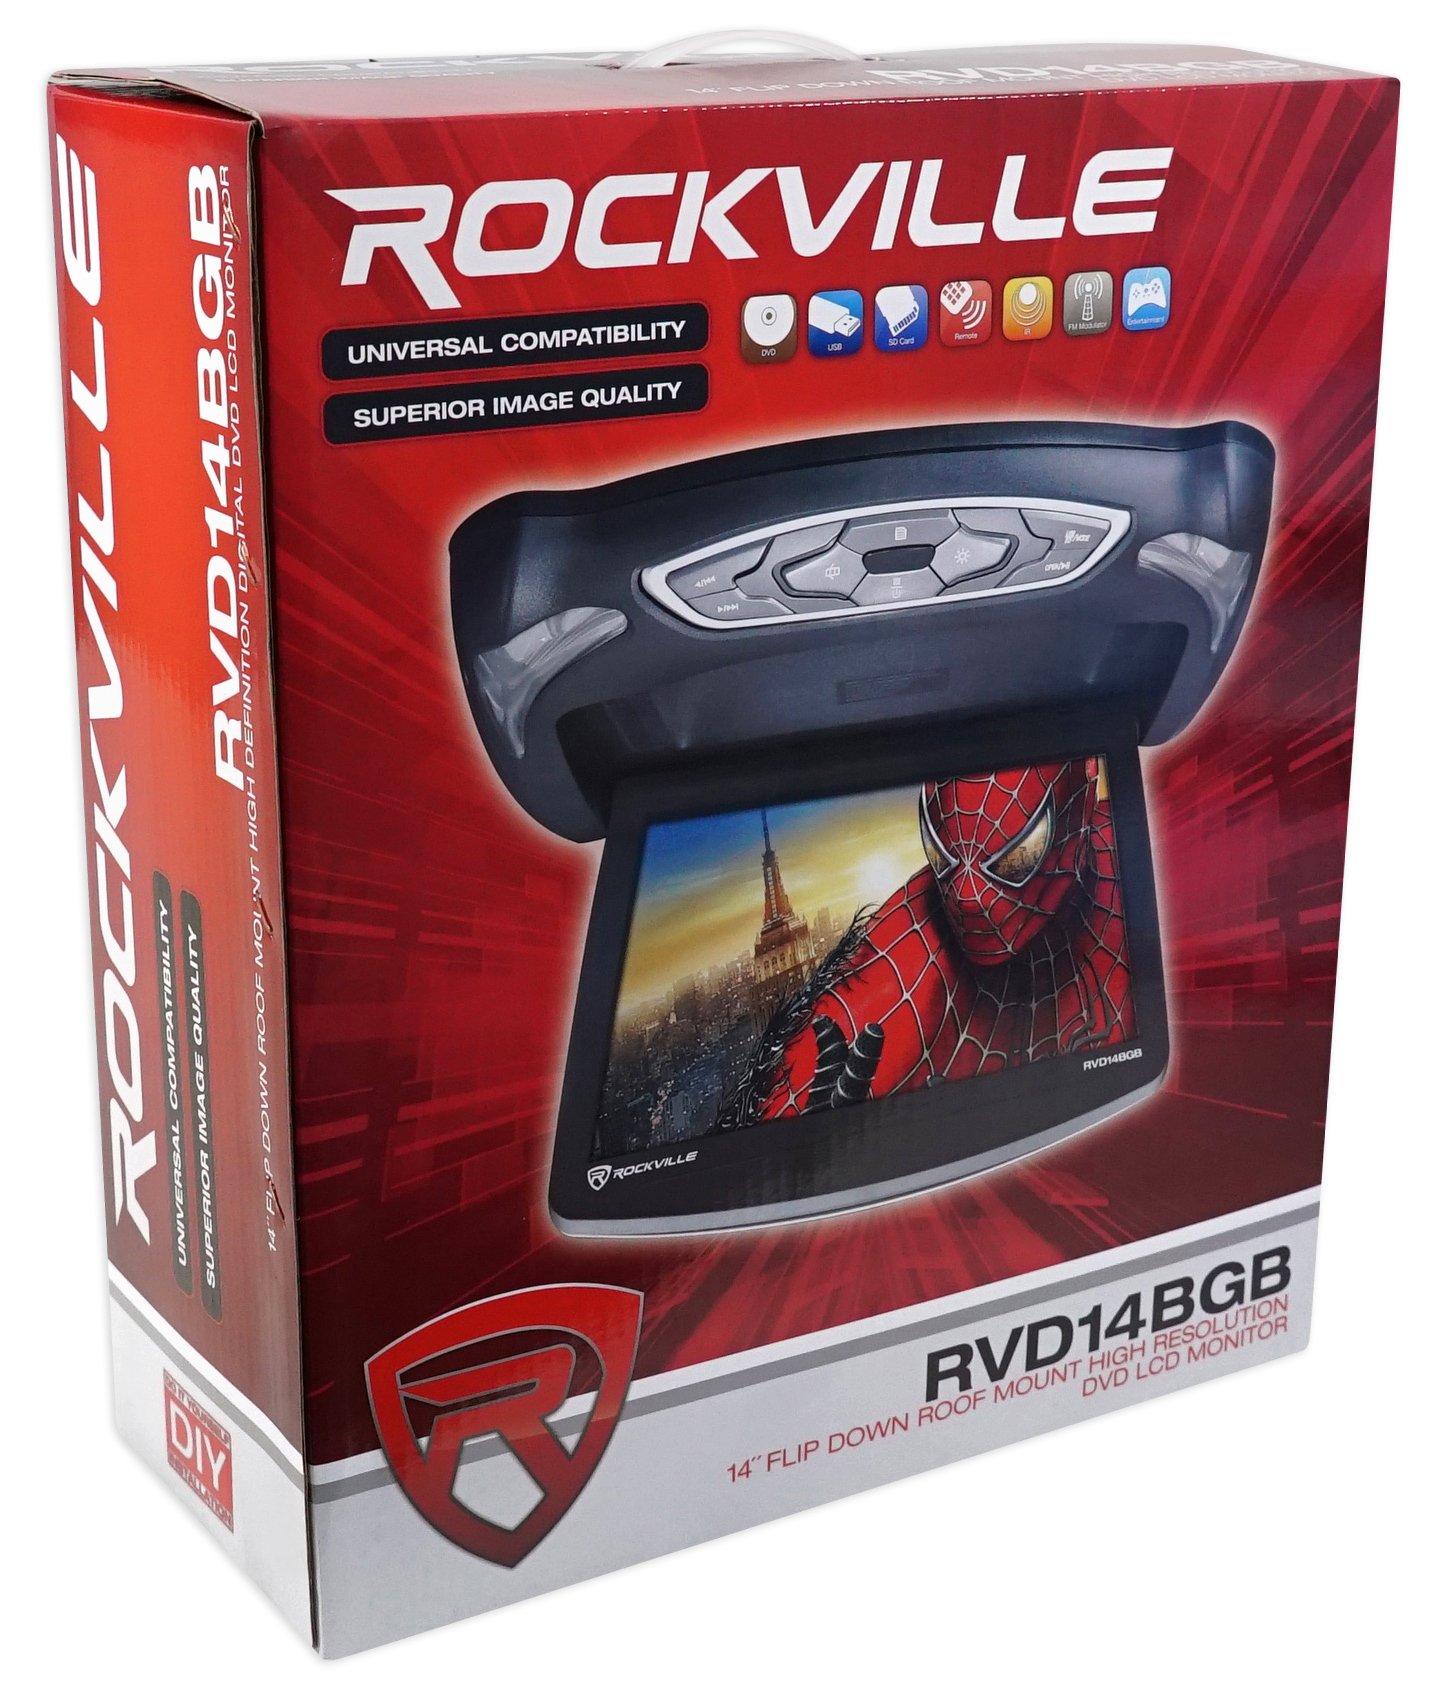 Rockville RVD14BGB Black/Grey/Tan 14'' Flip Down Car DVD Monitor+Games+Headphones by Rockville (Image #7)